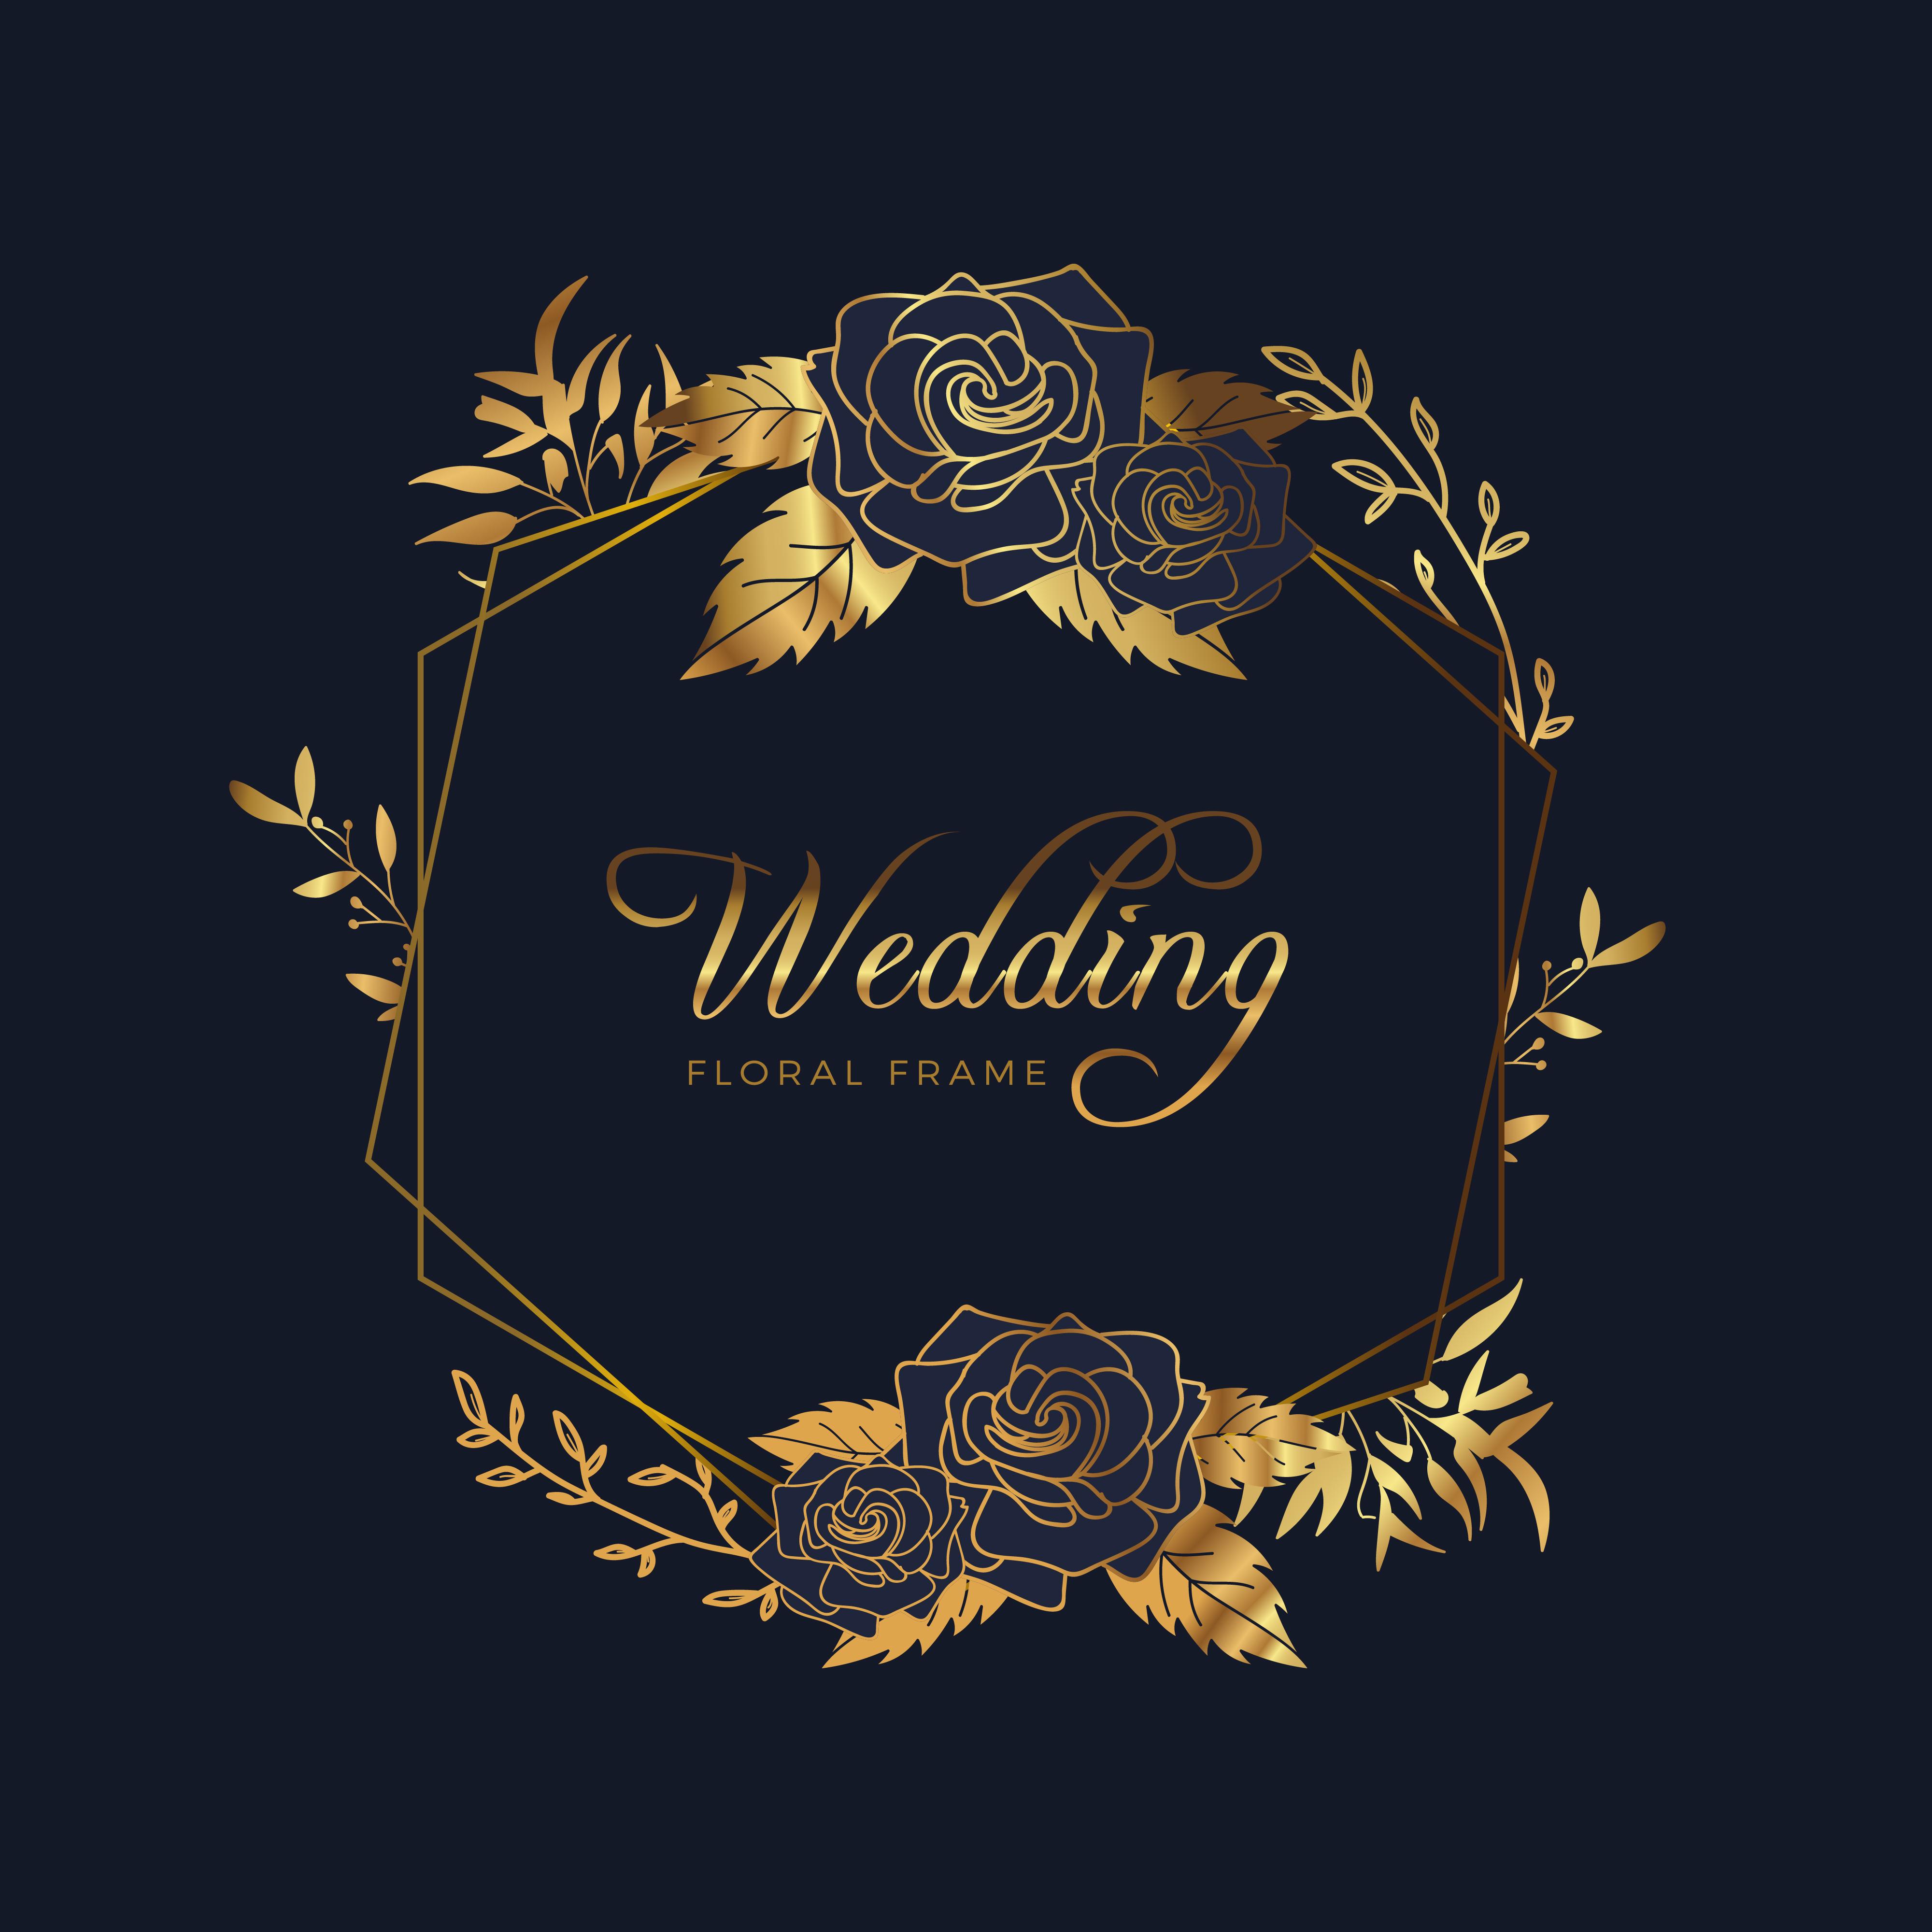 Golden Floral Frame Wedding Anniversary Background Download Free Vectors Clipart Graphics Vector Art